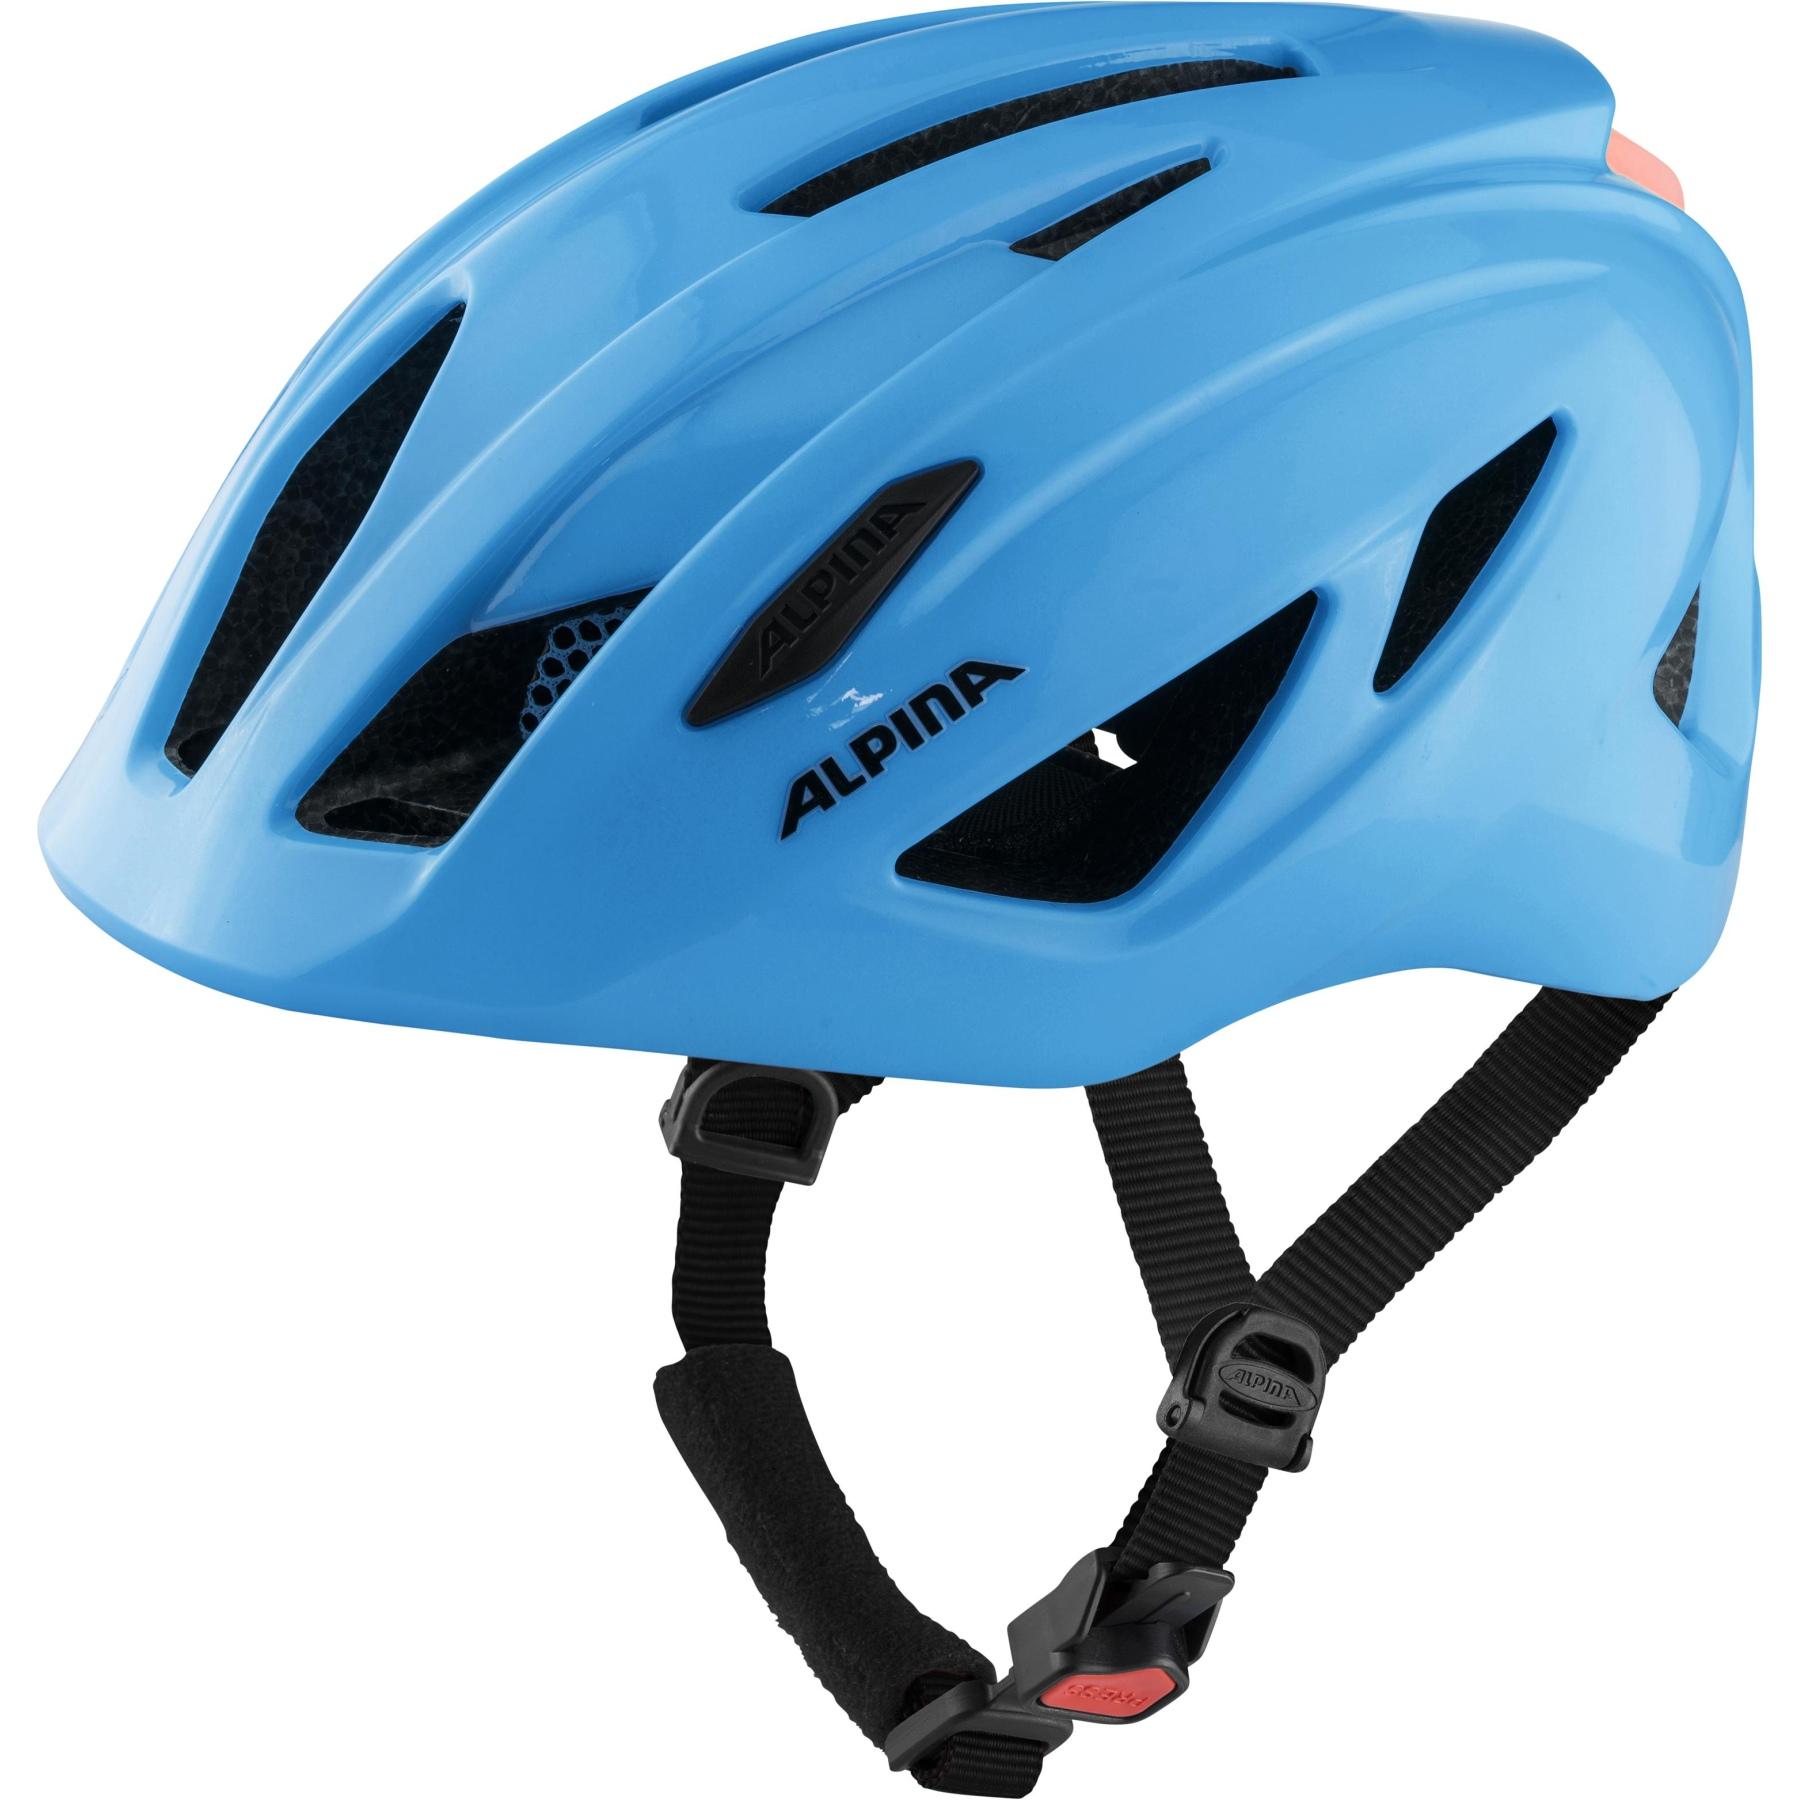 Alpina Pico Flash Kids Helmet - neon blue gloss